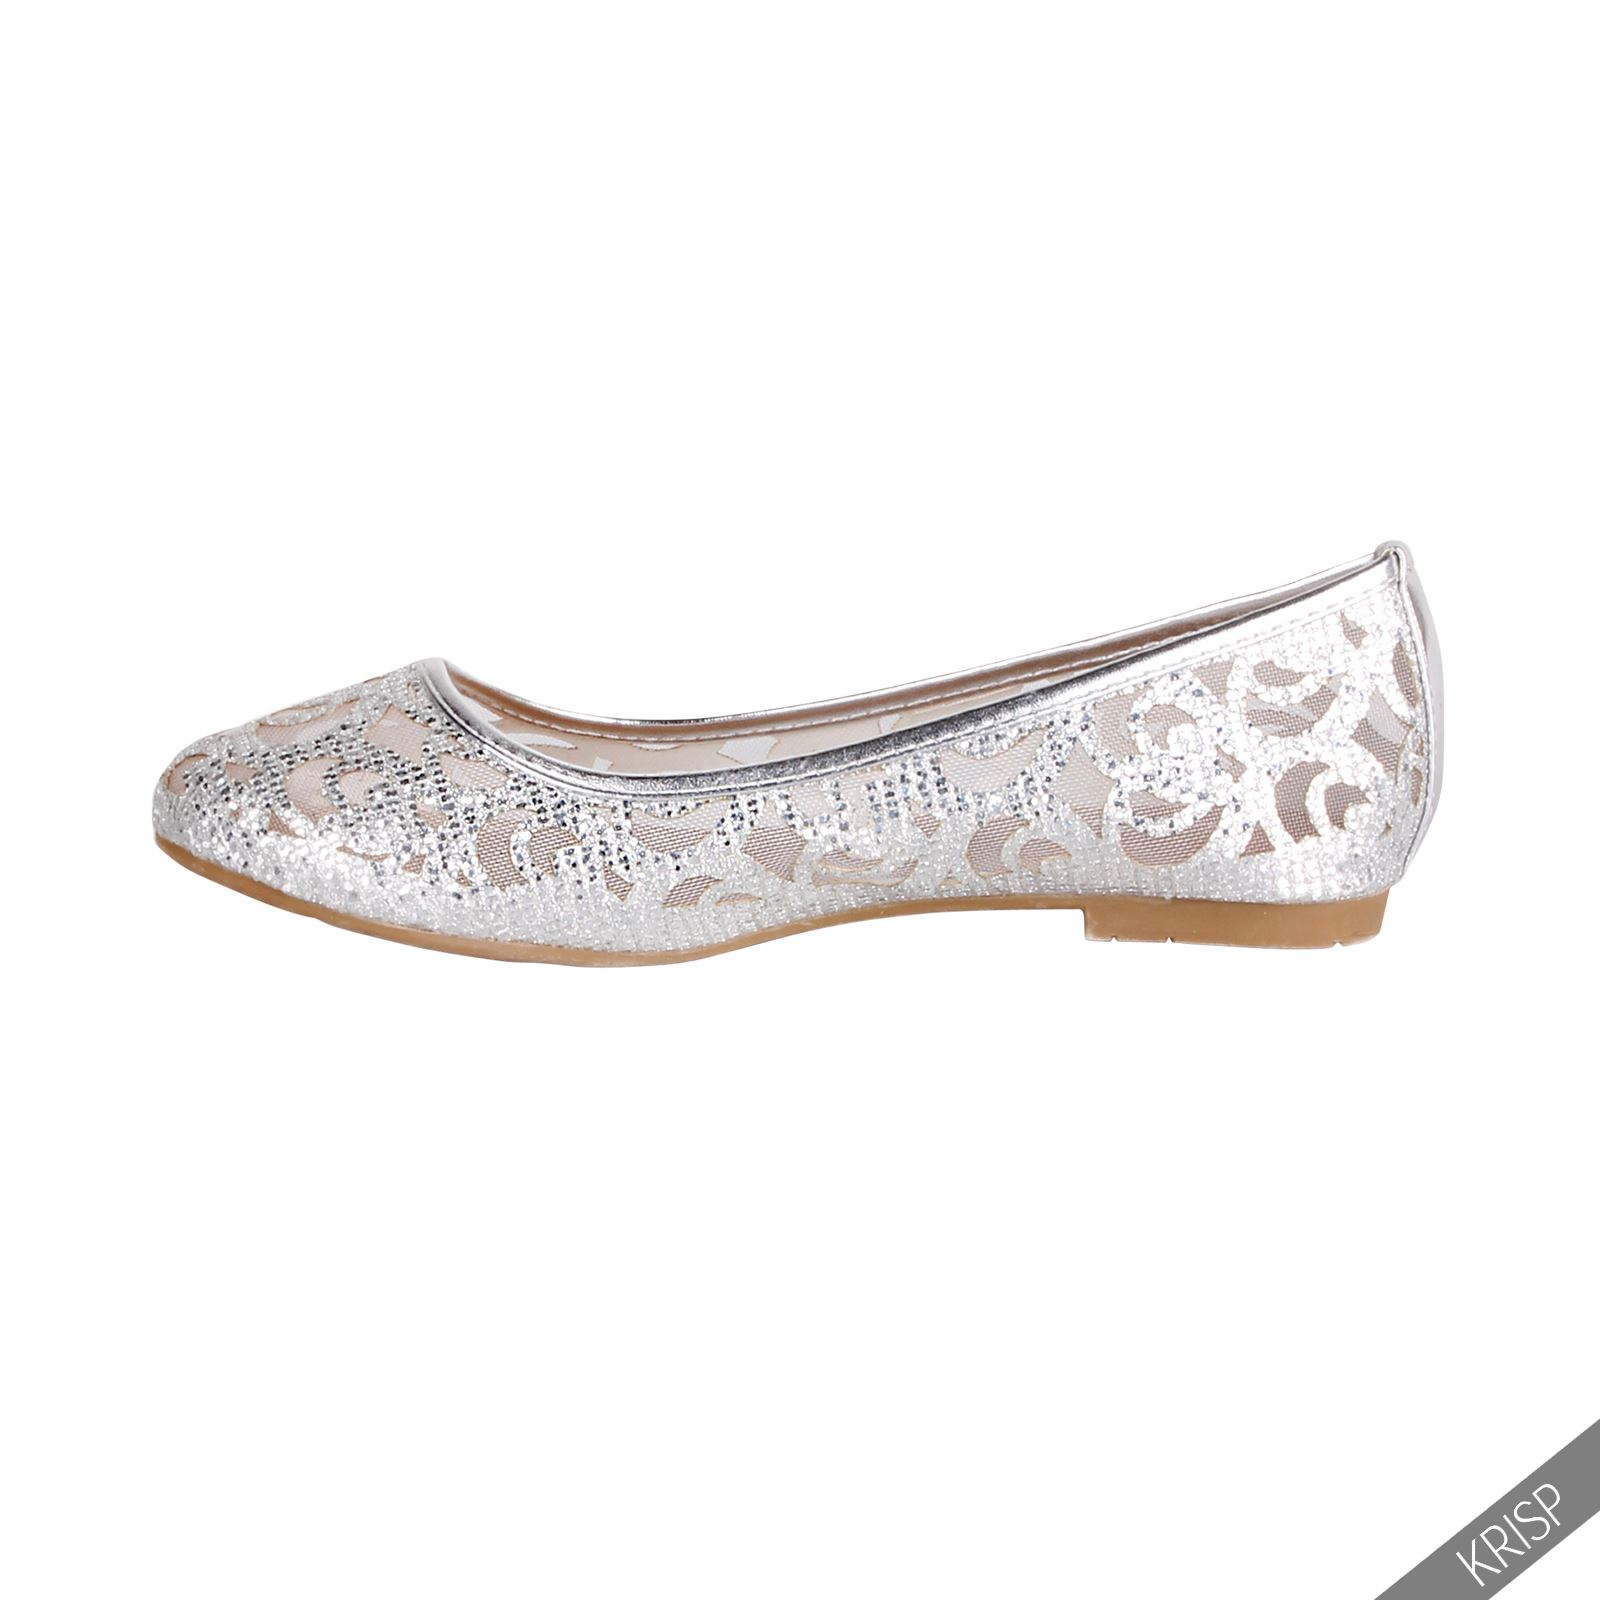 Women Glitter Ballerina Shoes Slip On Ballet Dolly Pumps Ladies Flats Flat Heels | EBay